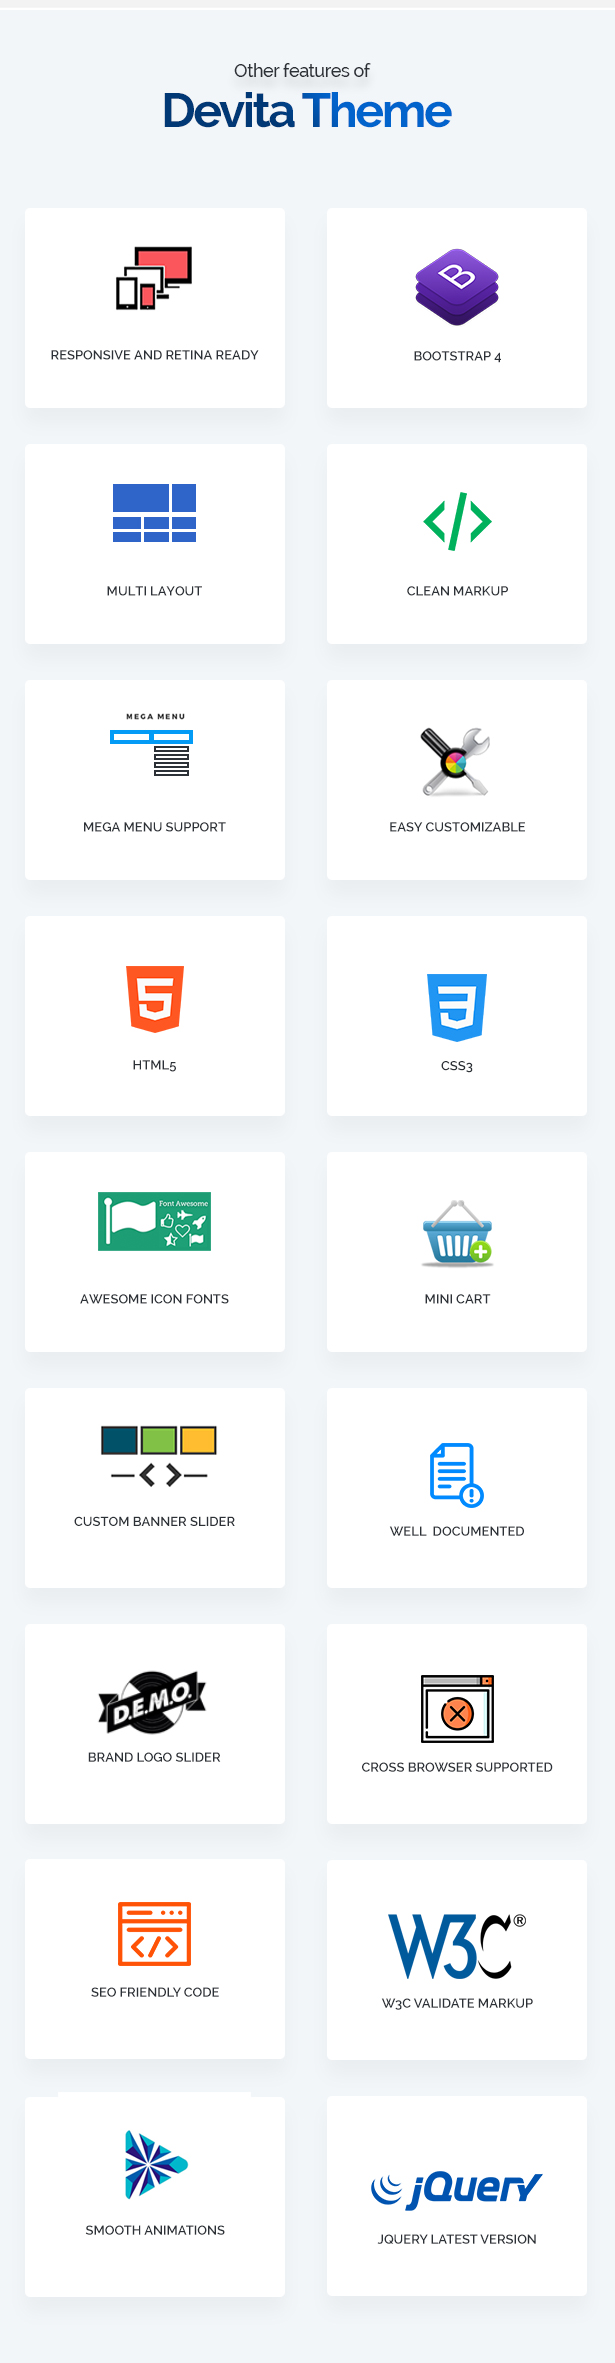 Devita - eCommerce Shopify Theme - 11